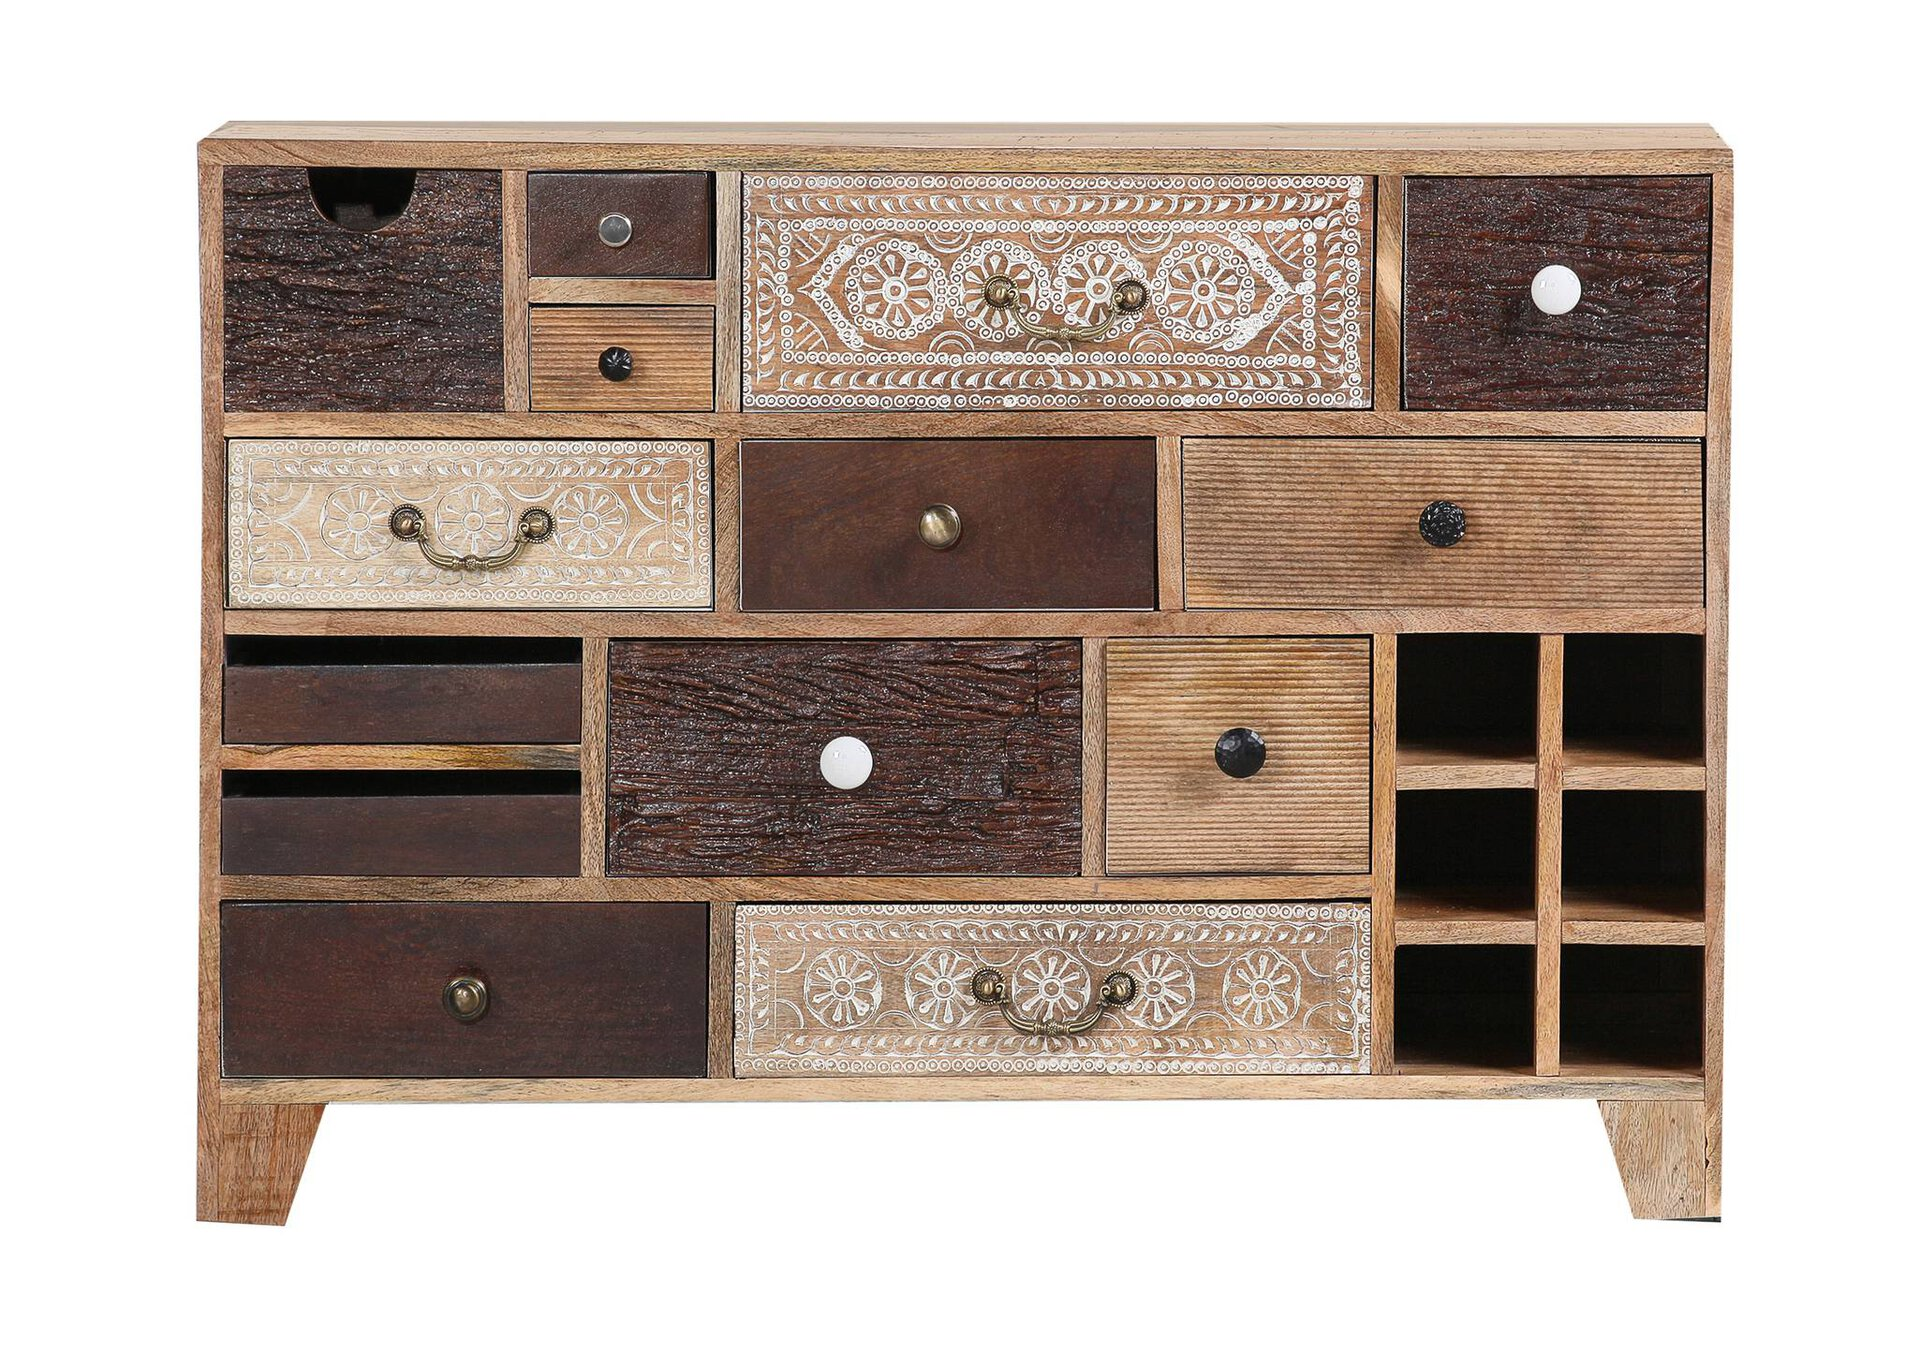 Sideboard Puno Gutmann Factory Holz mehrfarbig 39 x 80 x 114 cm